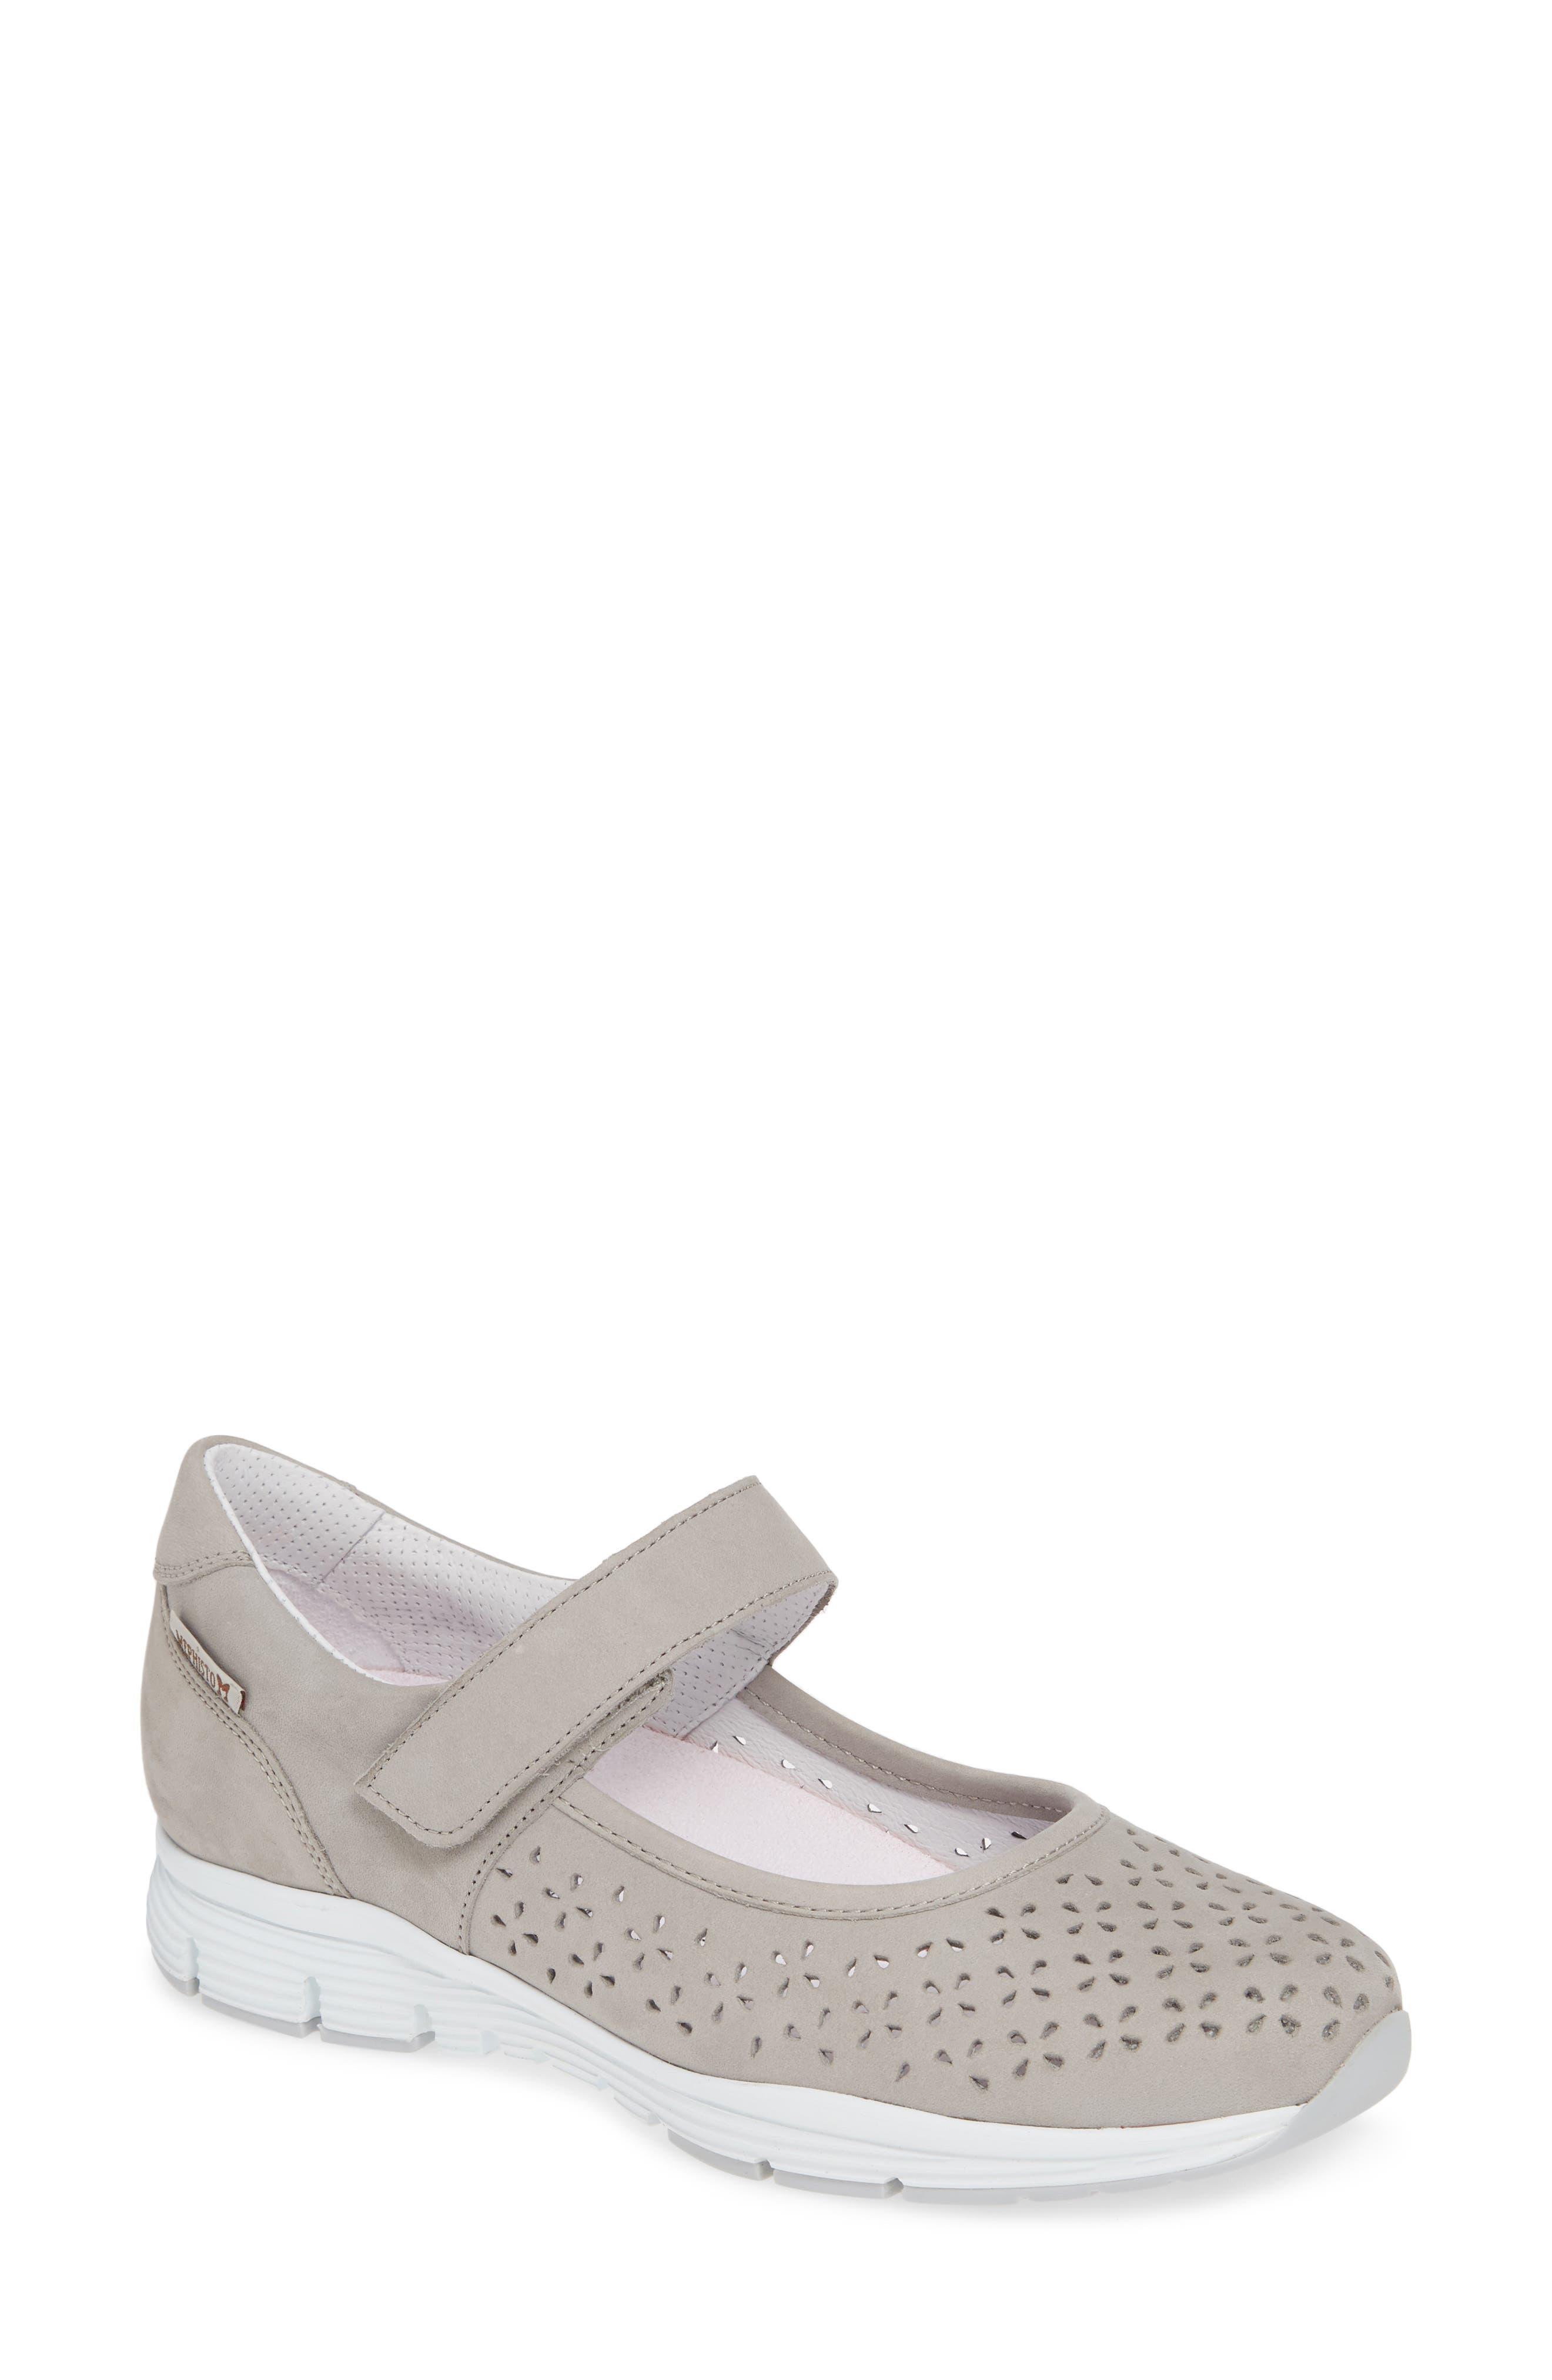 Mephisto Yelina Perforated Mary Jane Sneaker, Grey